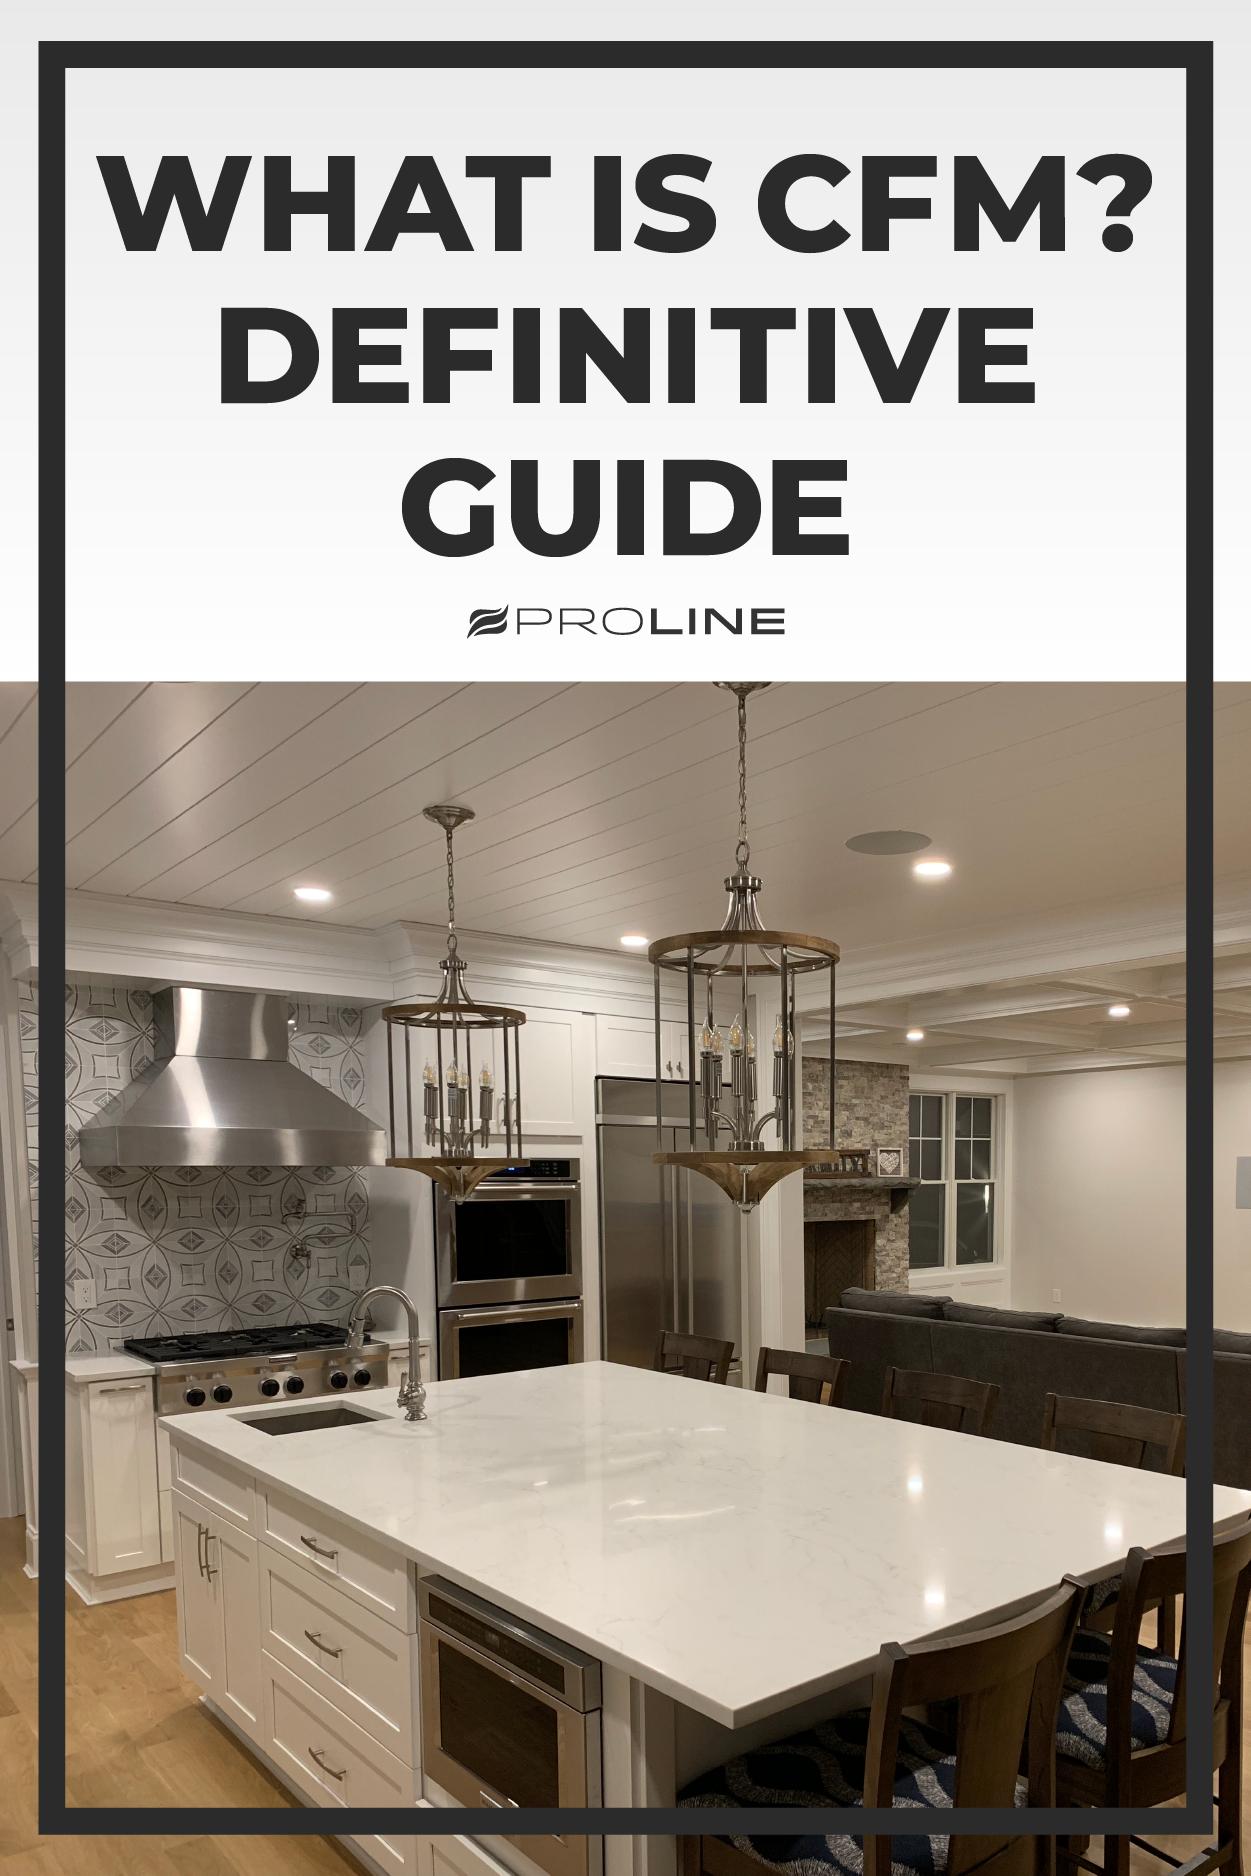 What Is Cfm Definitive Guide Farmhouse Interior Design Farmhouse Interior Range Hood